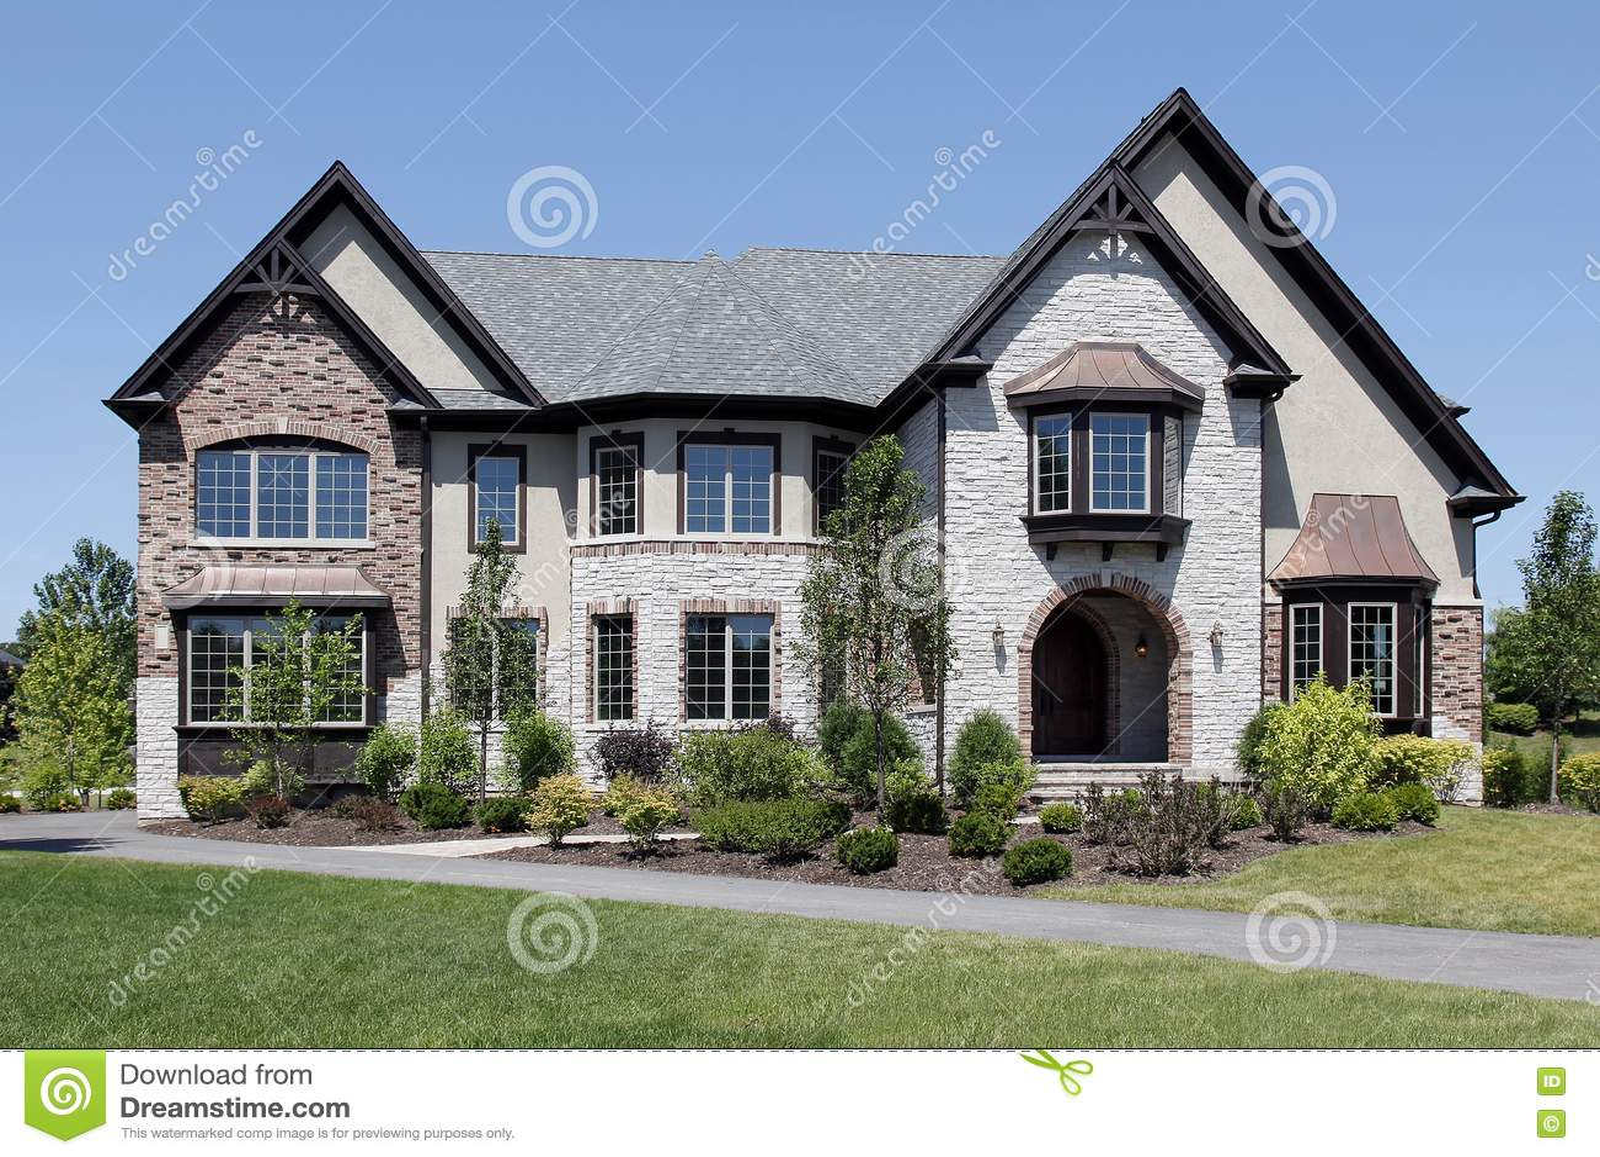 Luxury Stone And Brick Home Royalty Free Stock Photos